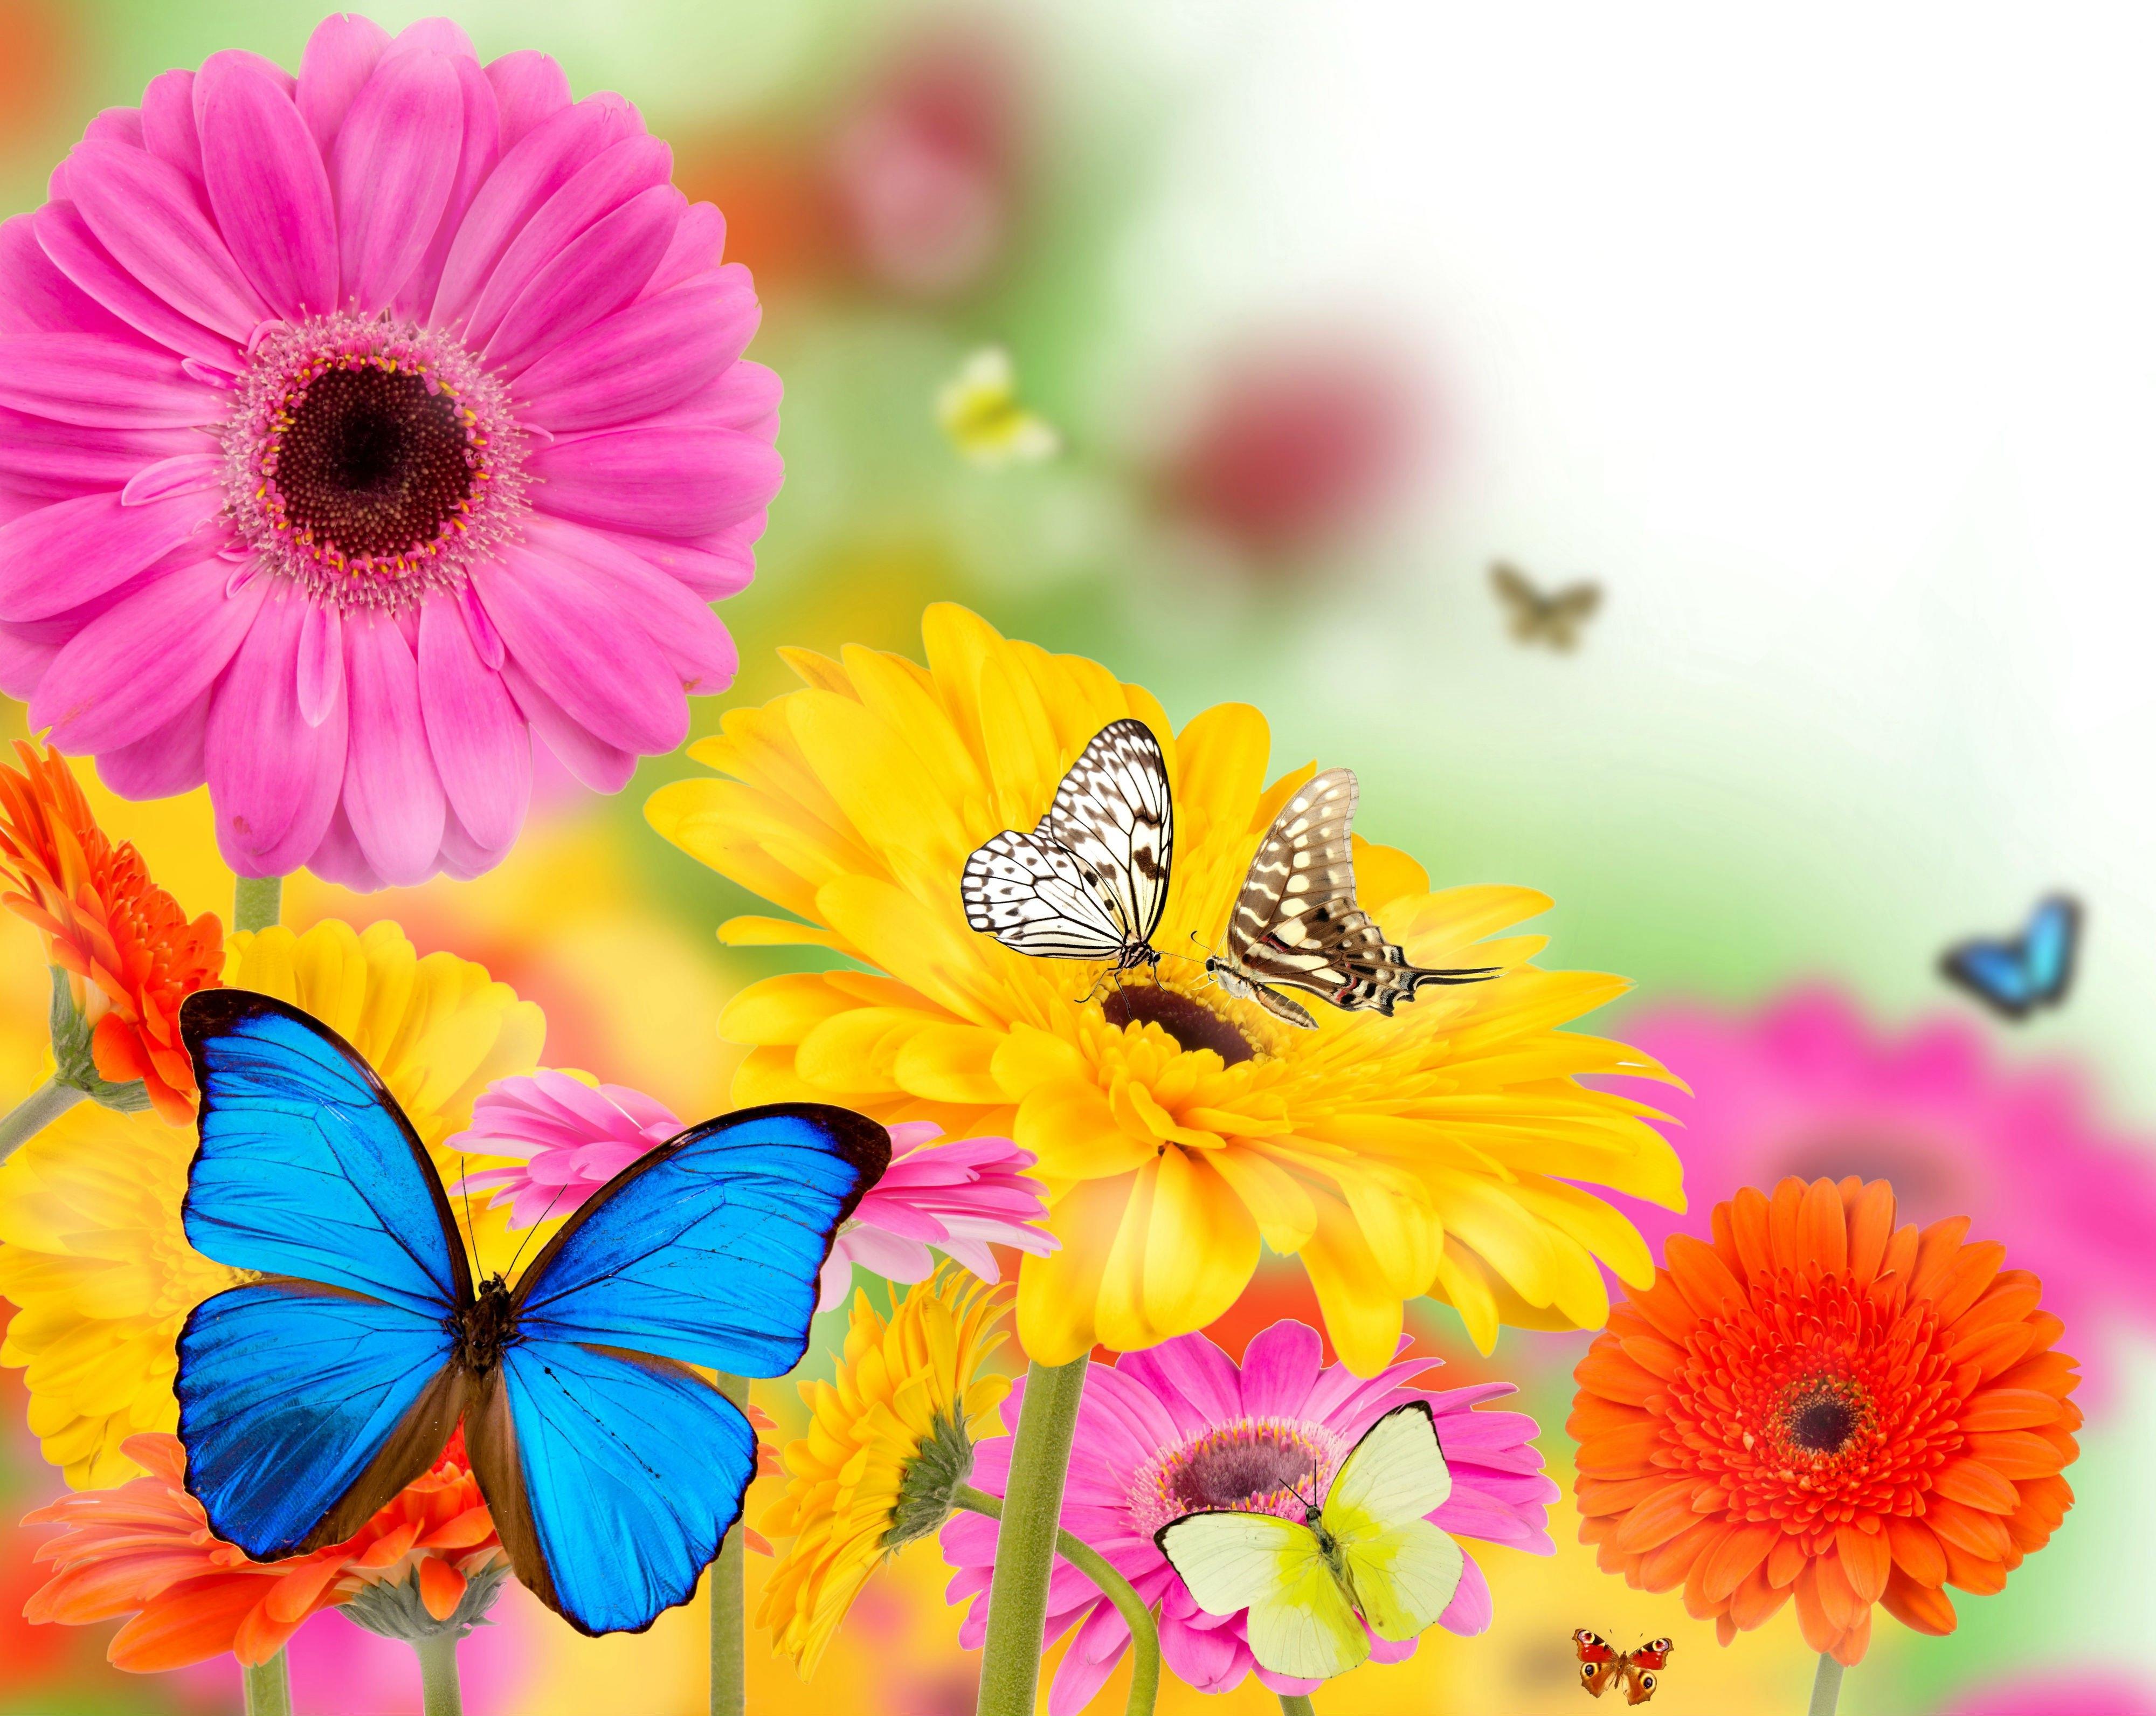 Spring flower wallpaper backgrounds wallpapersafari spring flowers and butterflies wallpapers hd desktop and 4000x3183 mightylinksfo